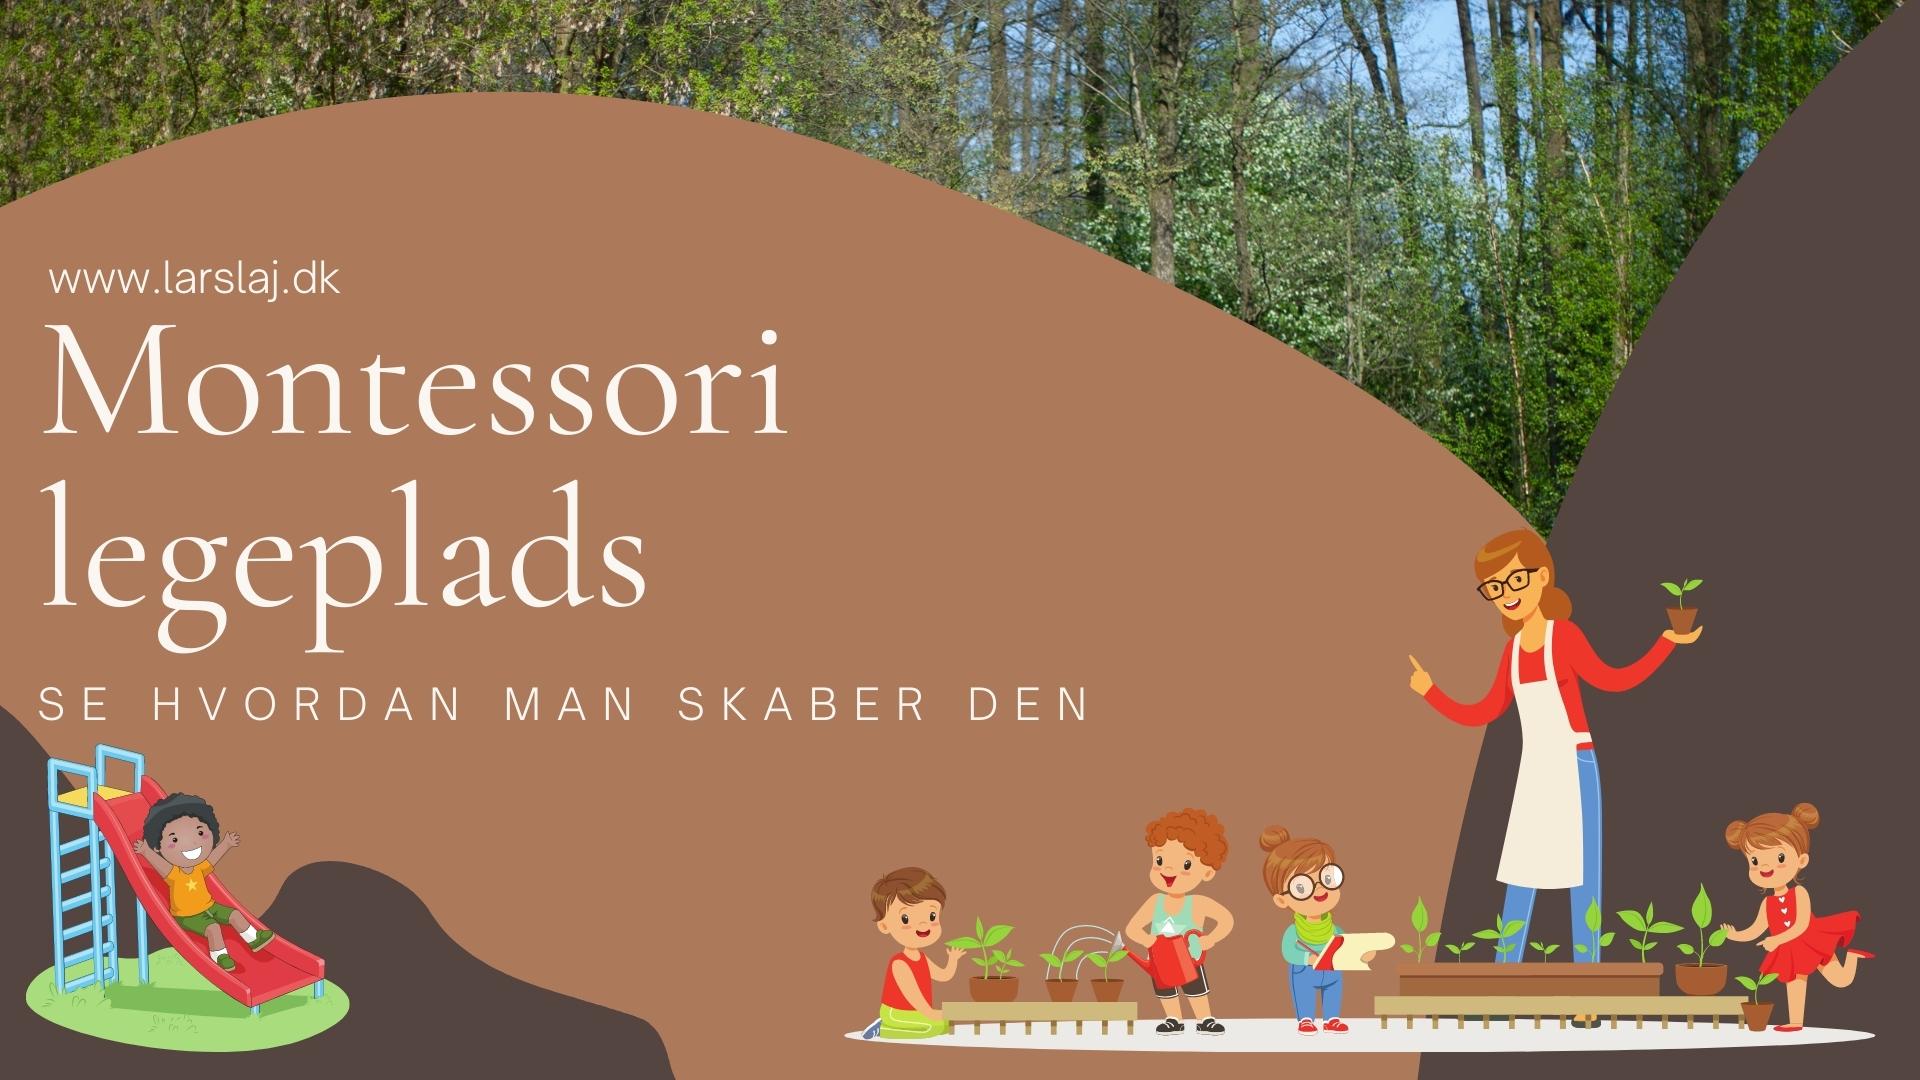 Montessori legepladser